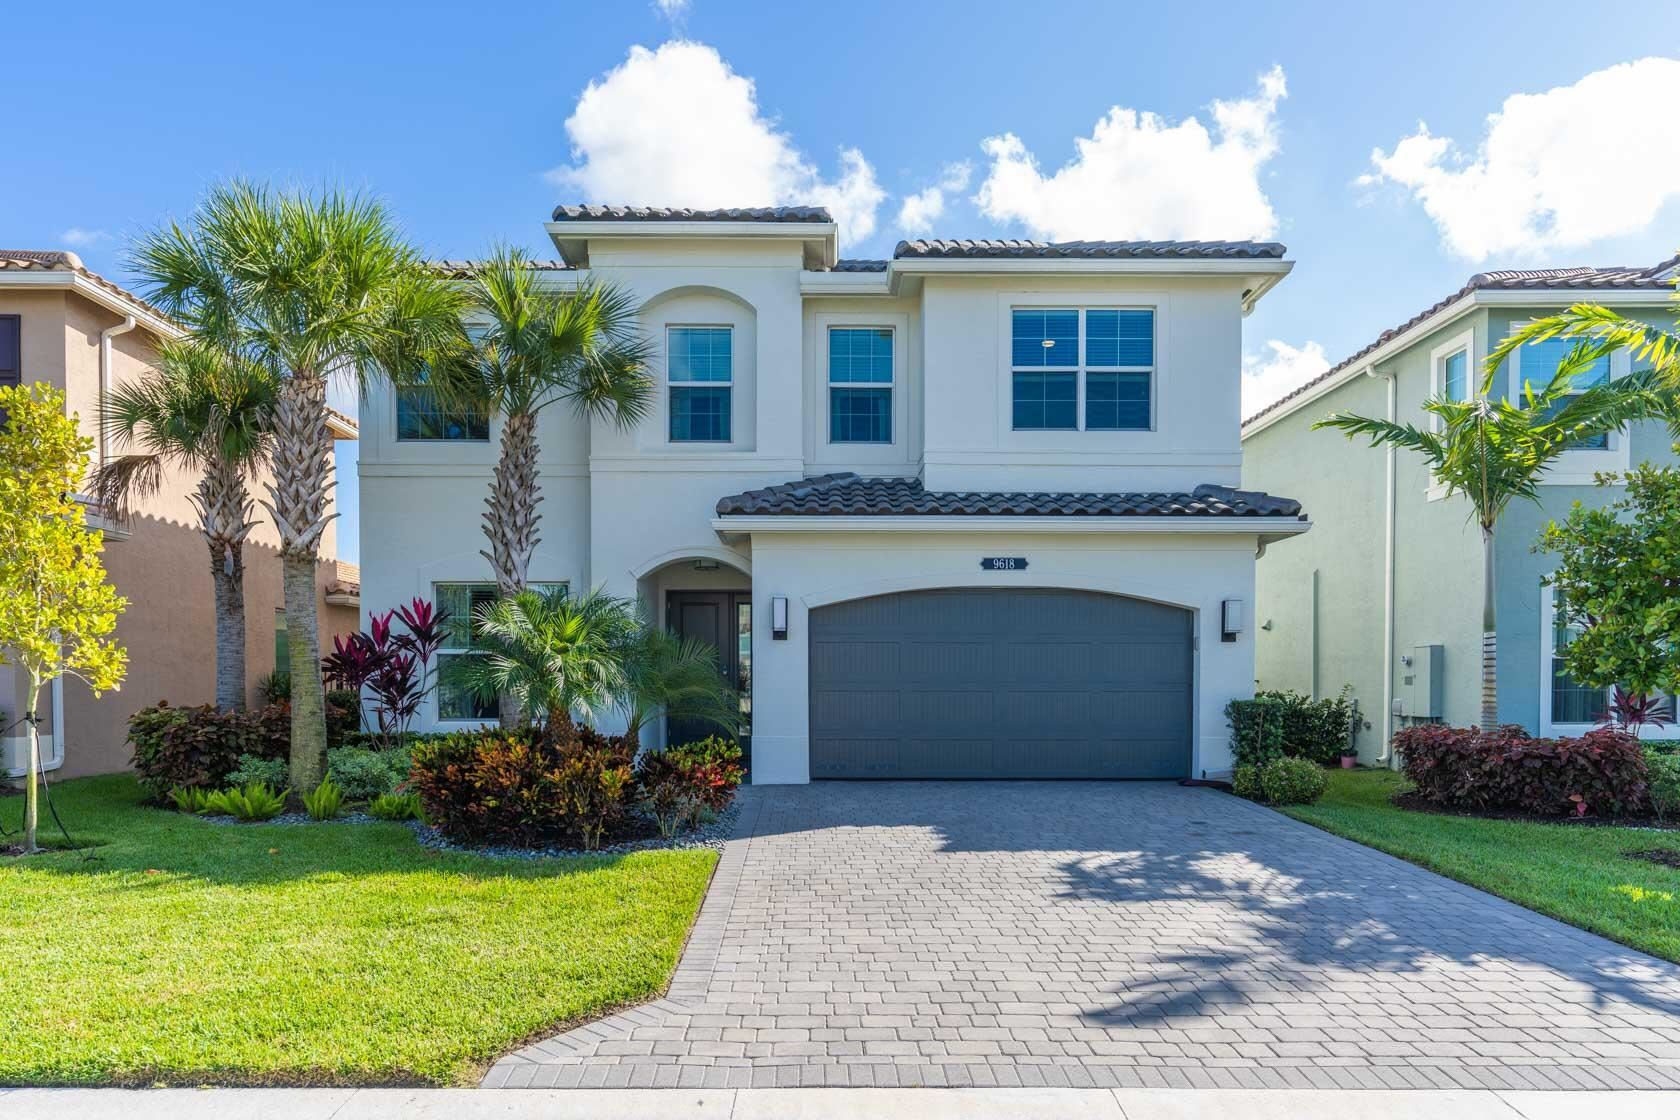 9618 Brook Isles Avenue, Delray Beach, FL 33446 - MLS#: RX-10752613